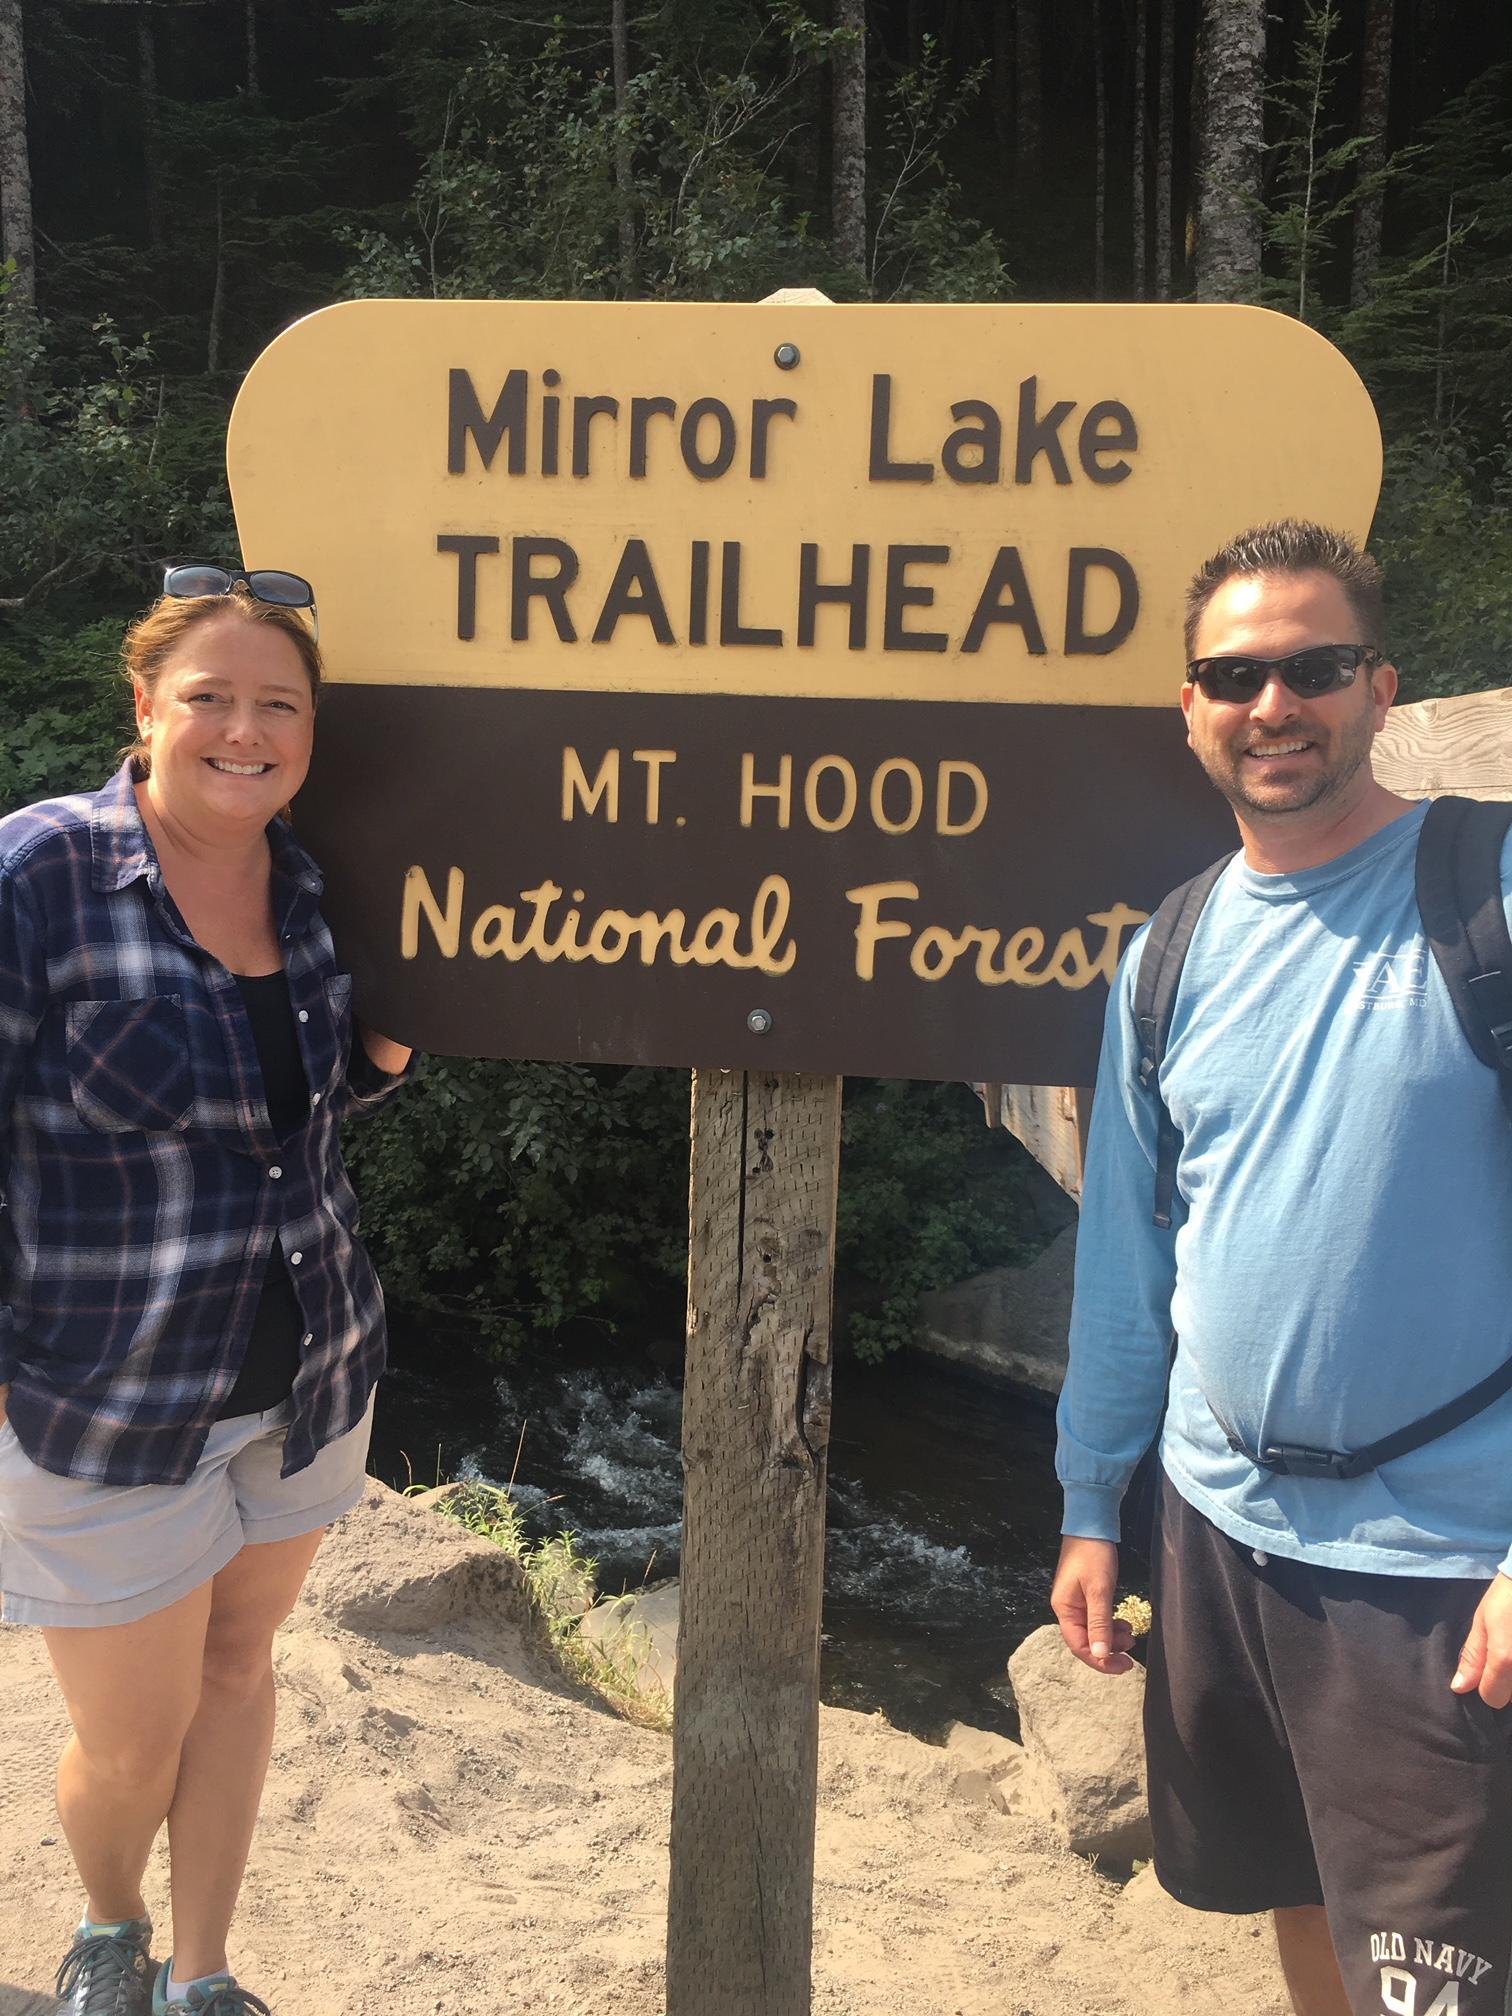 Joel Rubin and his wife Sarah hiking at Mt. Hood